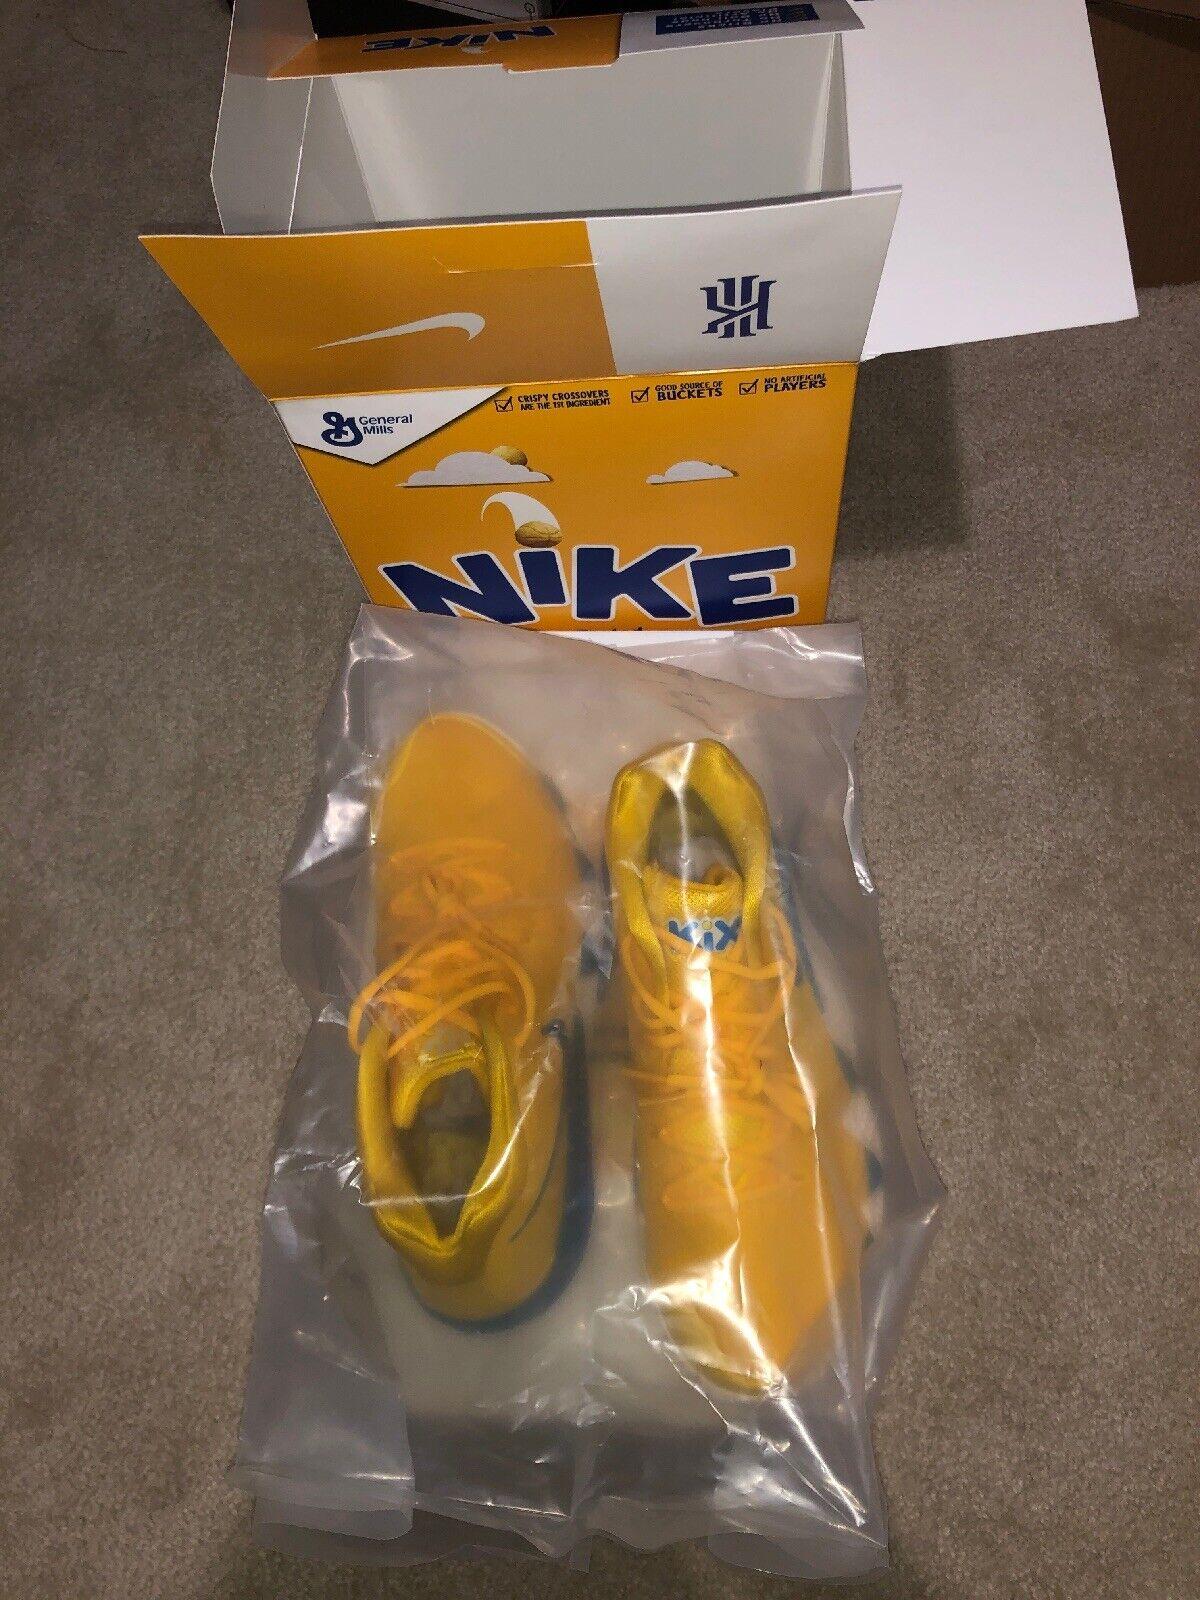 Nike LIMITED Kyrie 4 Cereal Pack  KIX  avec Package Spécial Homme Sz 9.5 NEUF avec boite